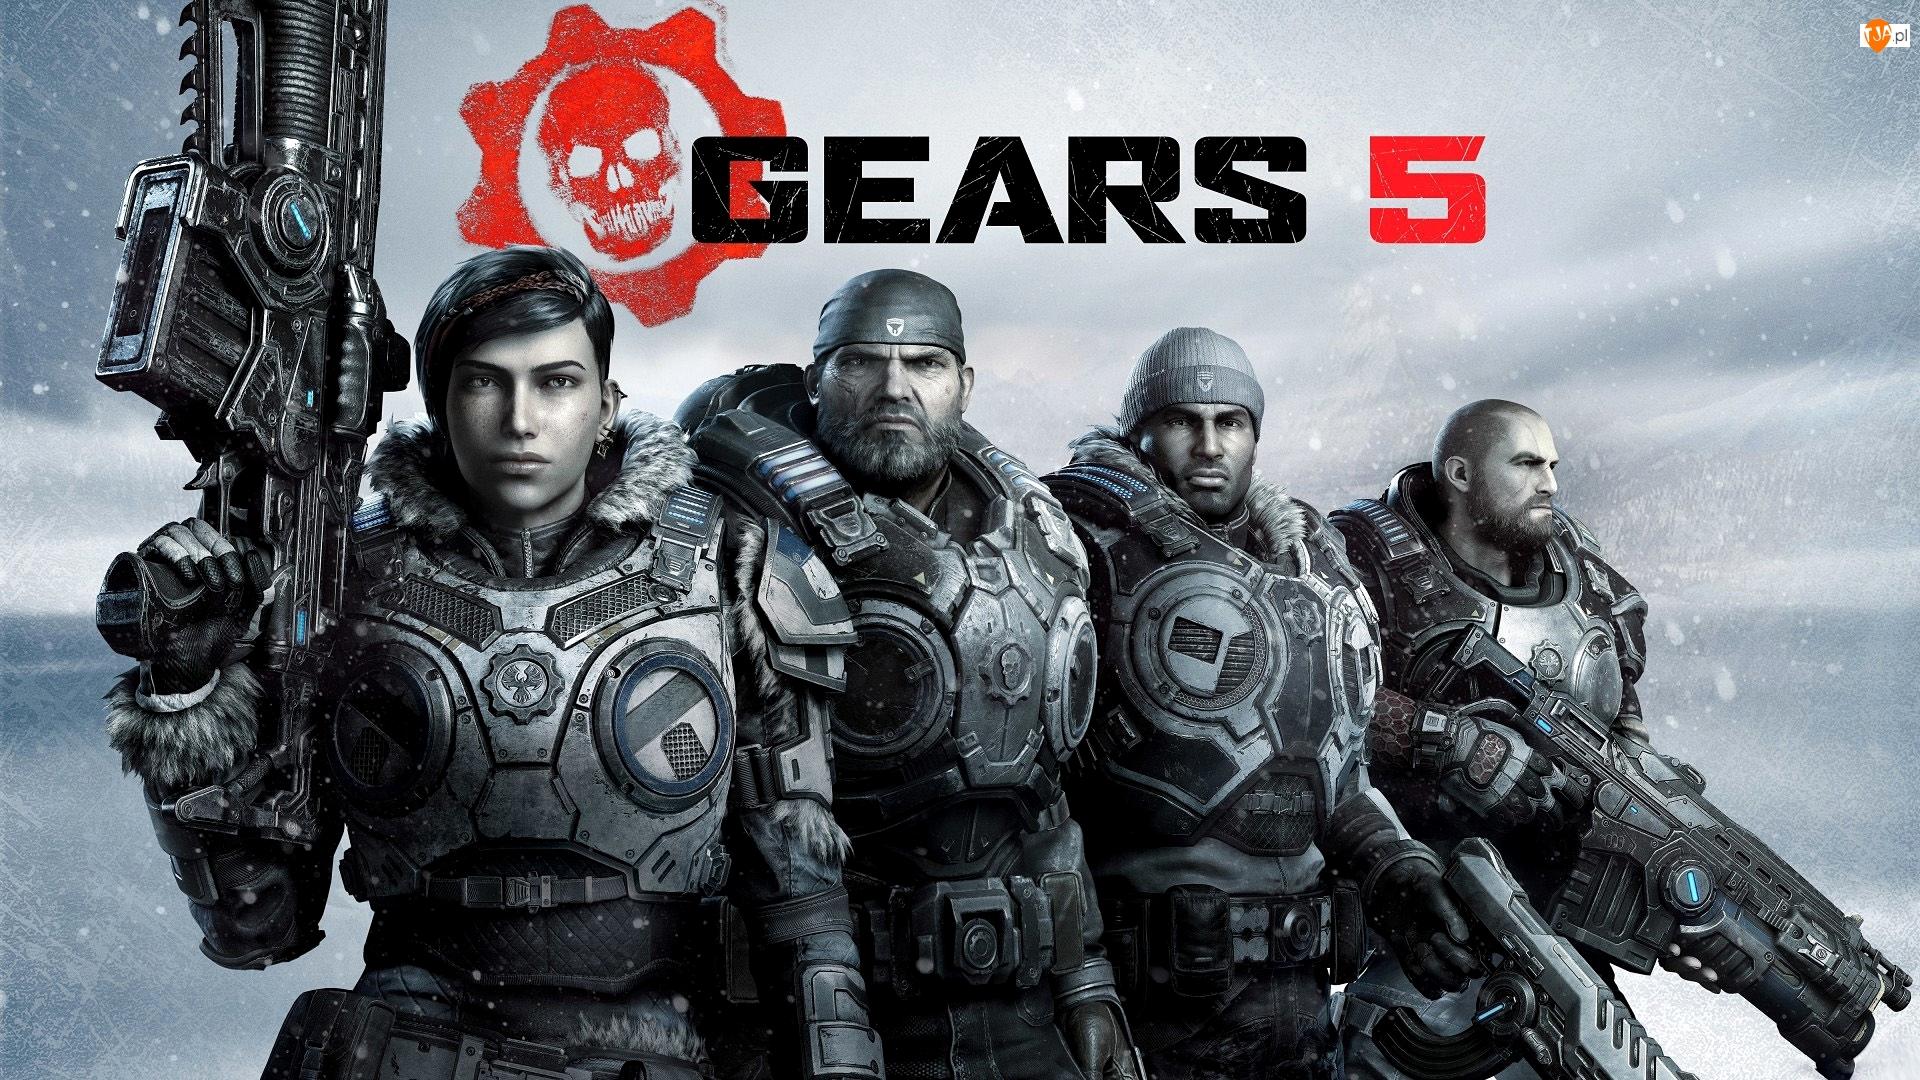 Gears 5, Broń, Gears of War, Gra, Wojownicy